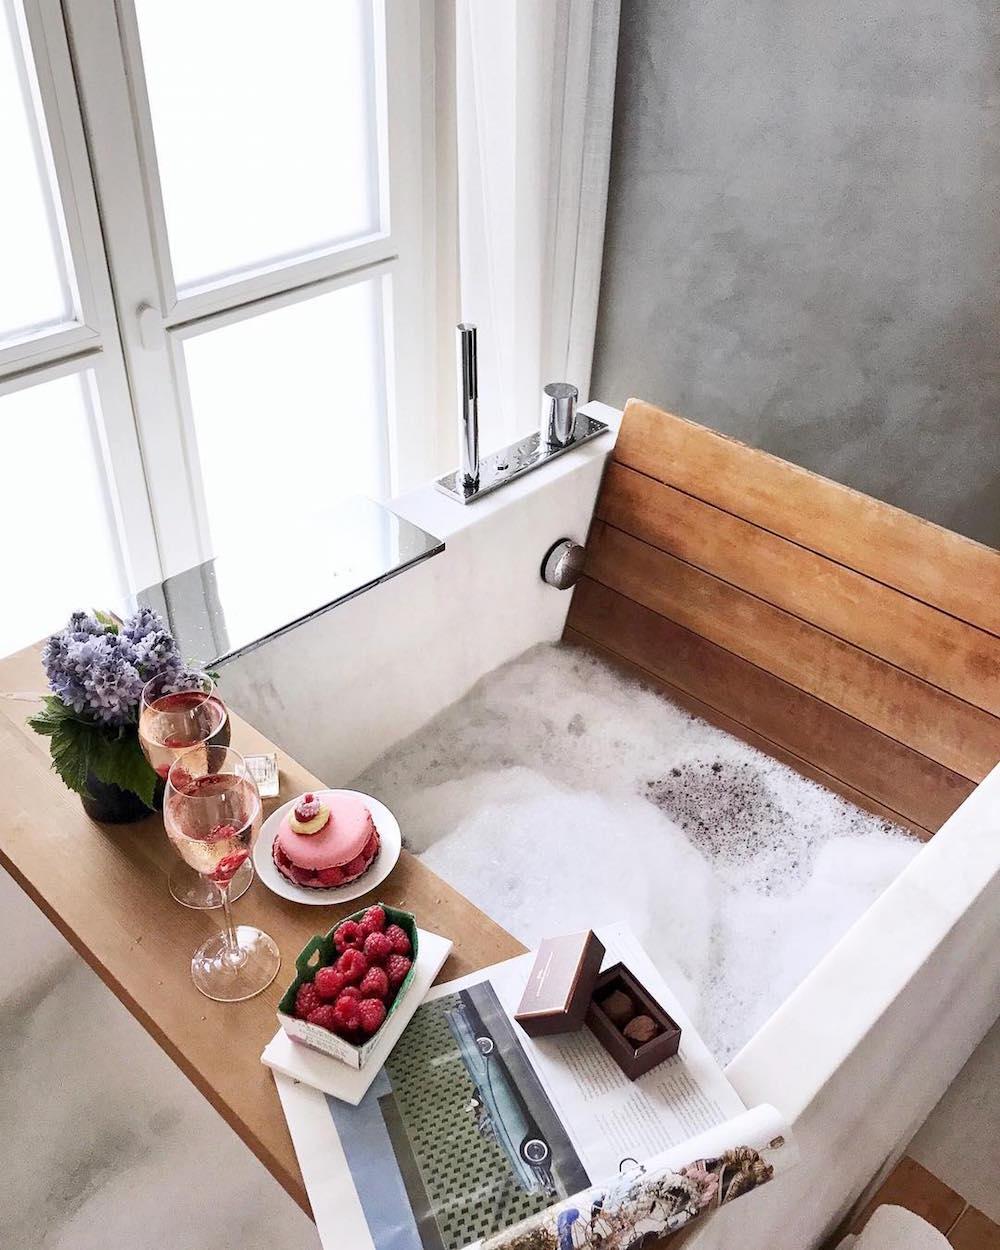 saint valentin 2018 idée romantique bain macarons